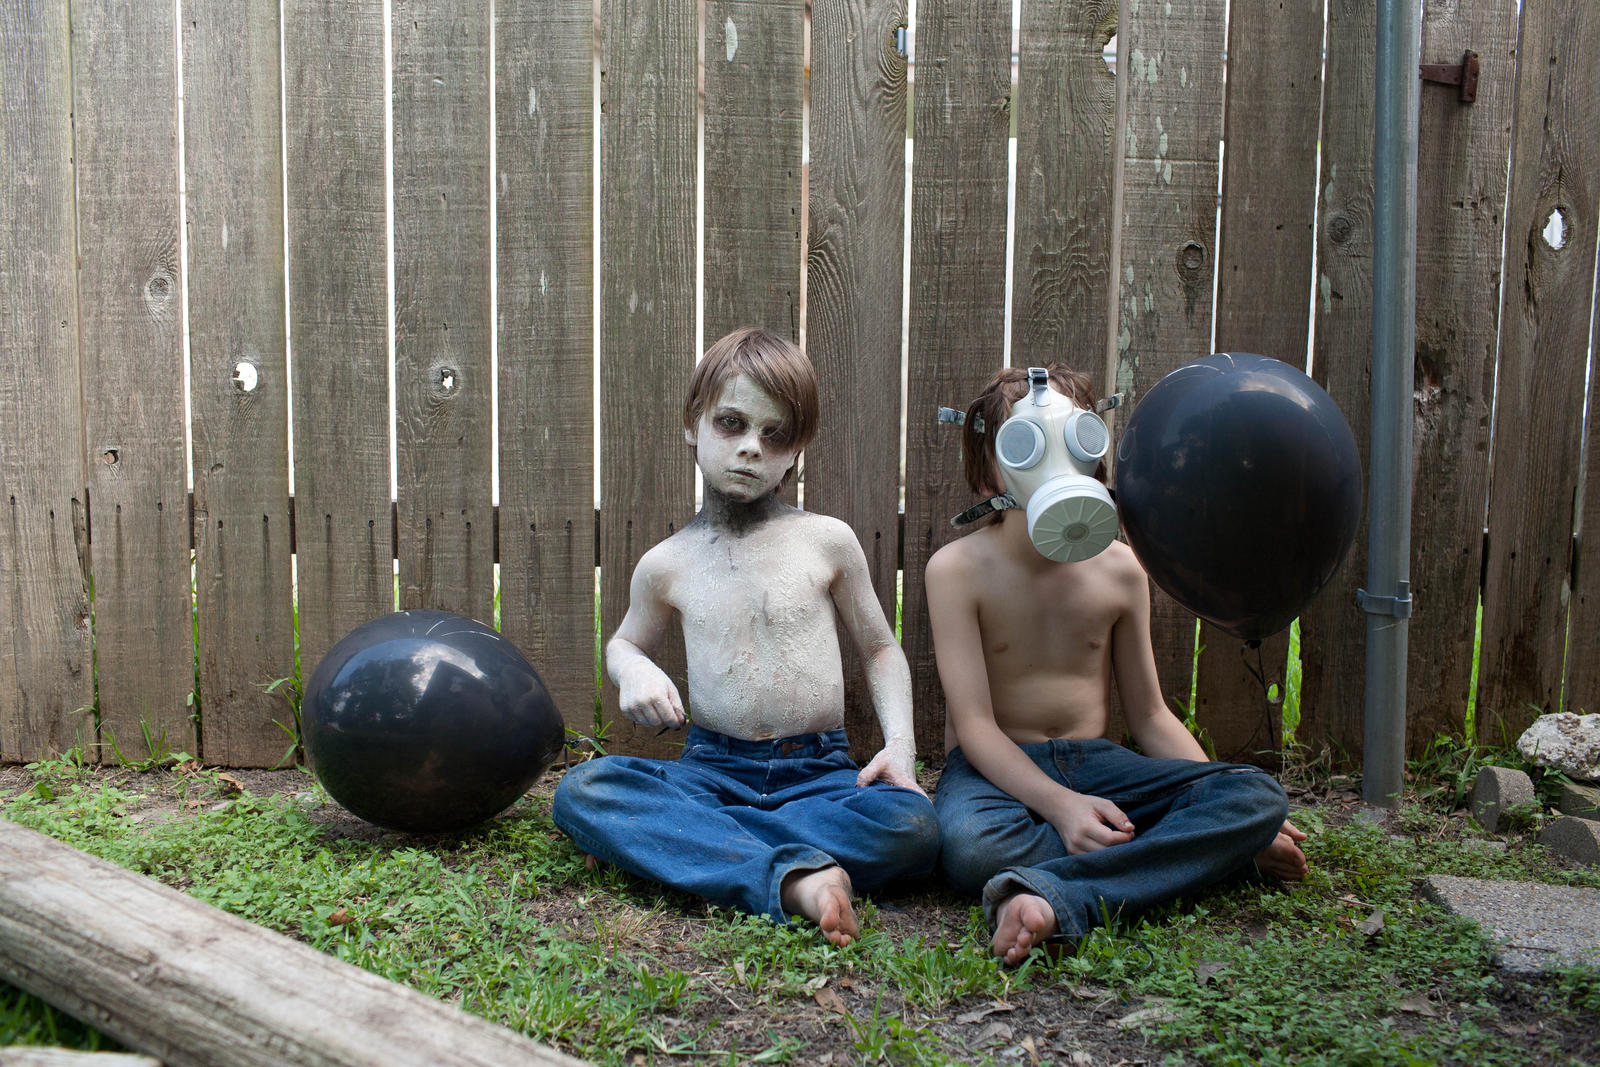 creepy kids by VioletBreezeStock